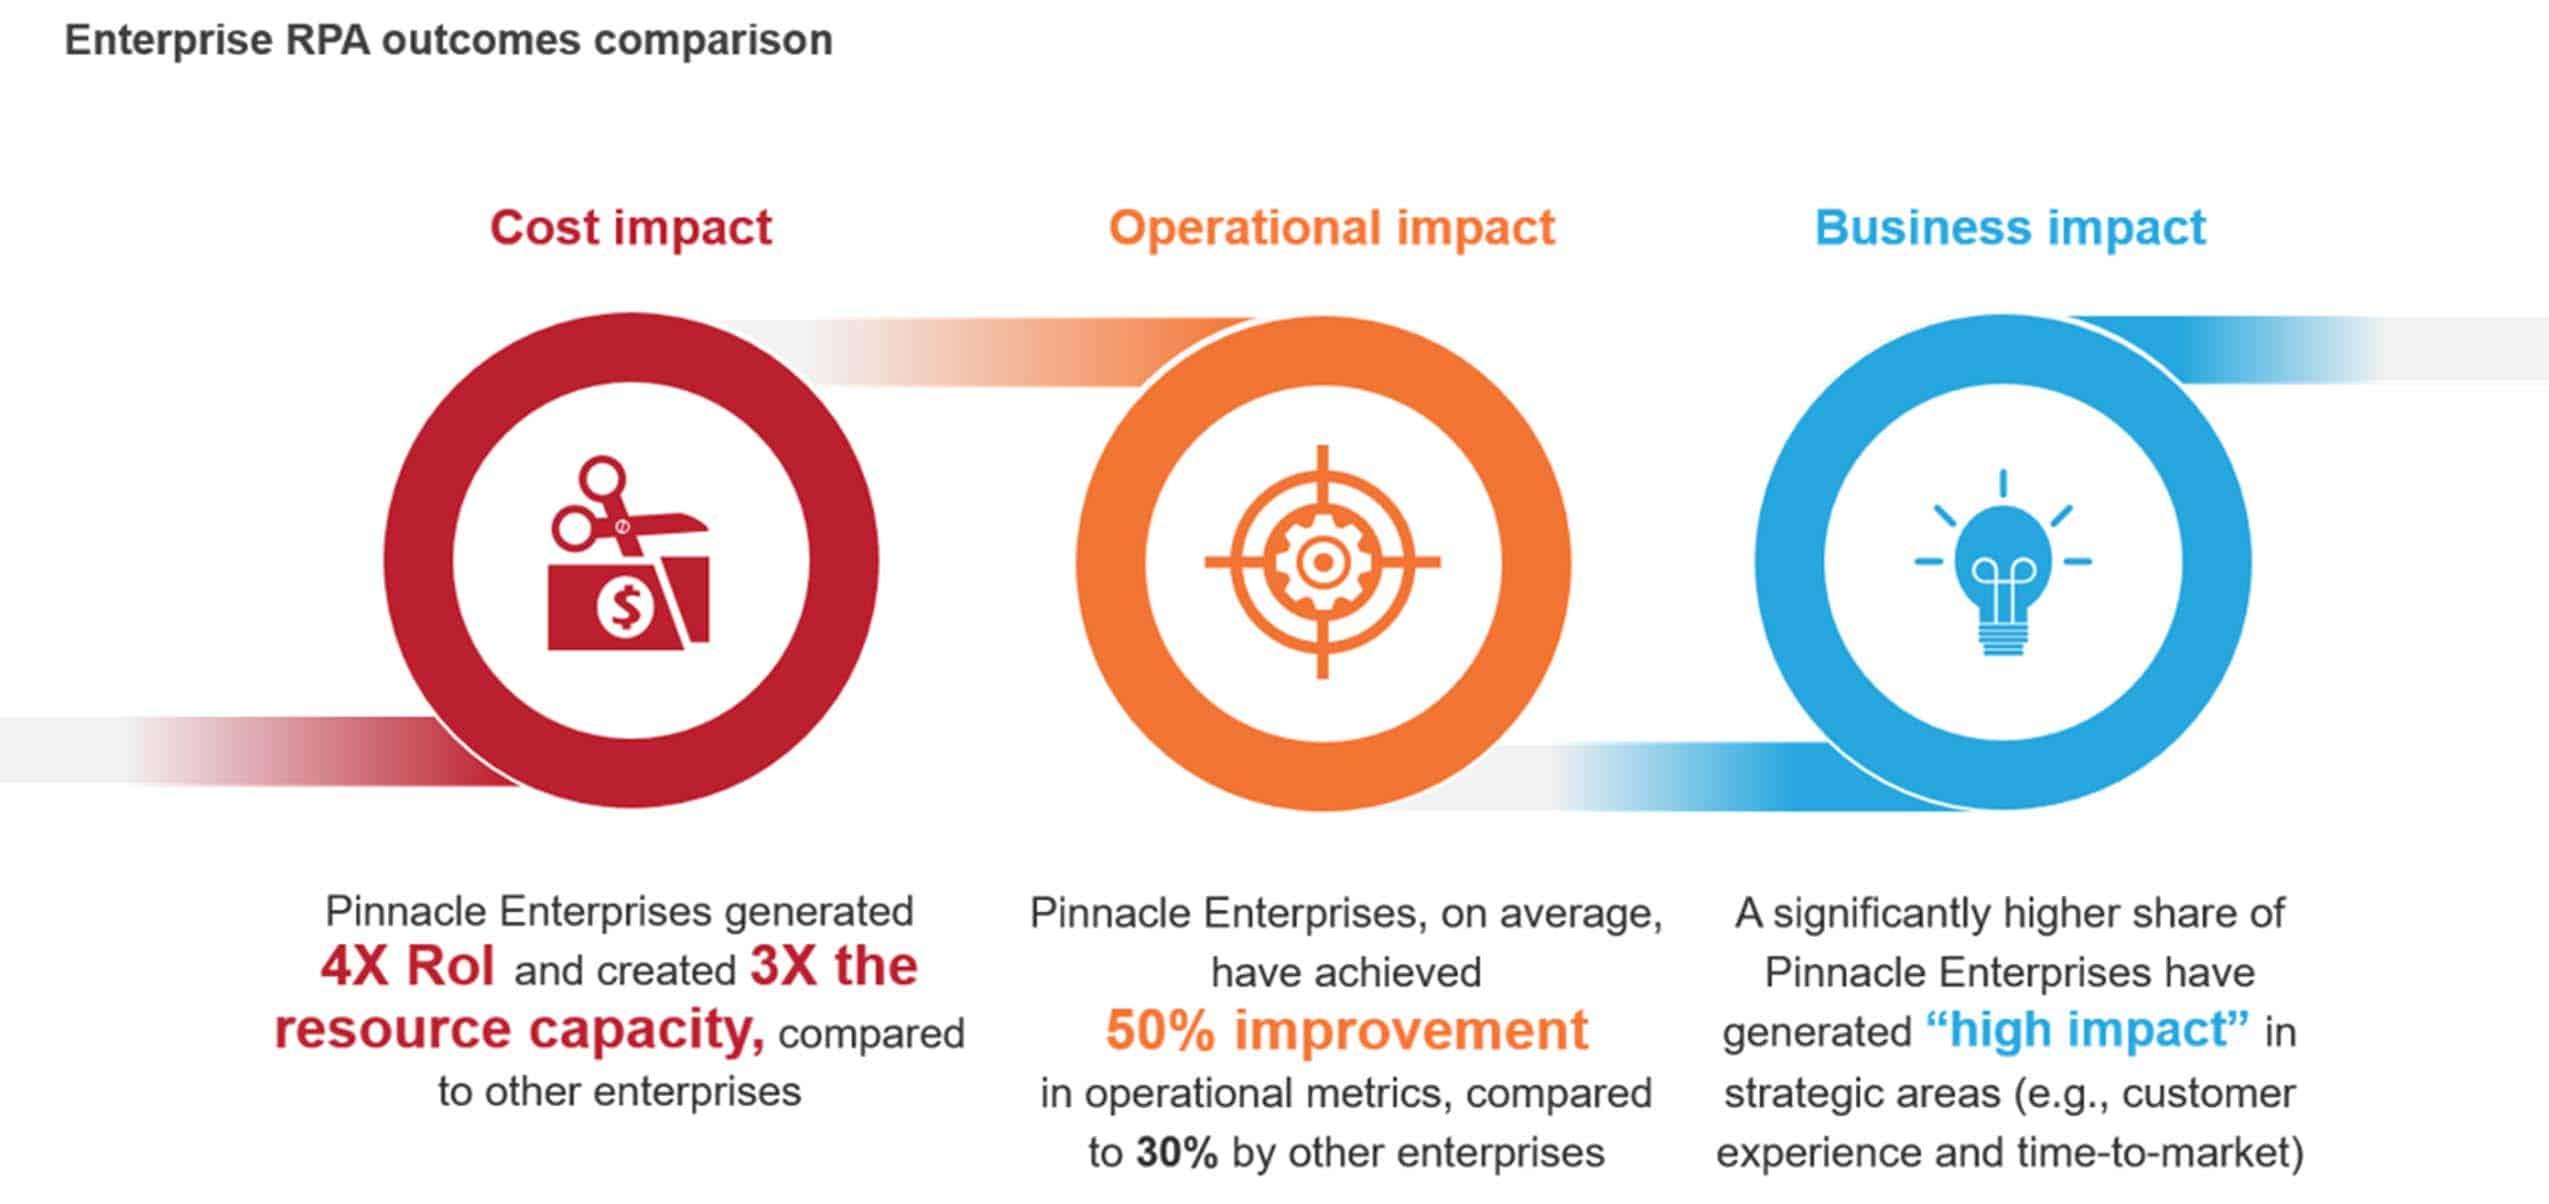 chart with 3 circular impact representations